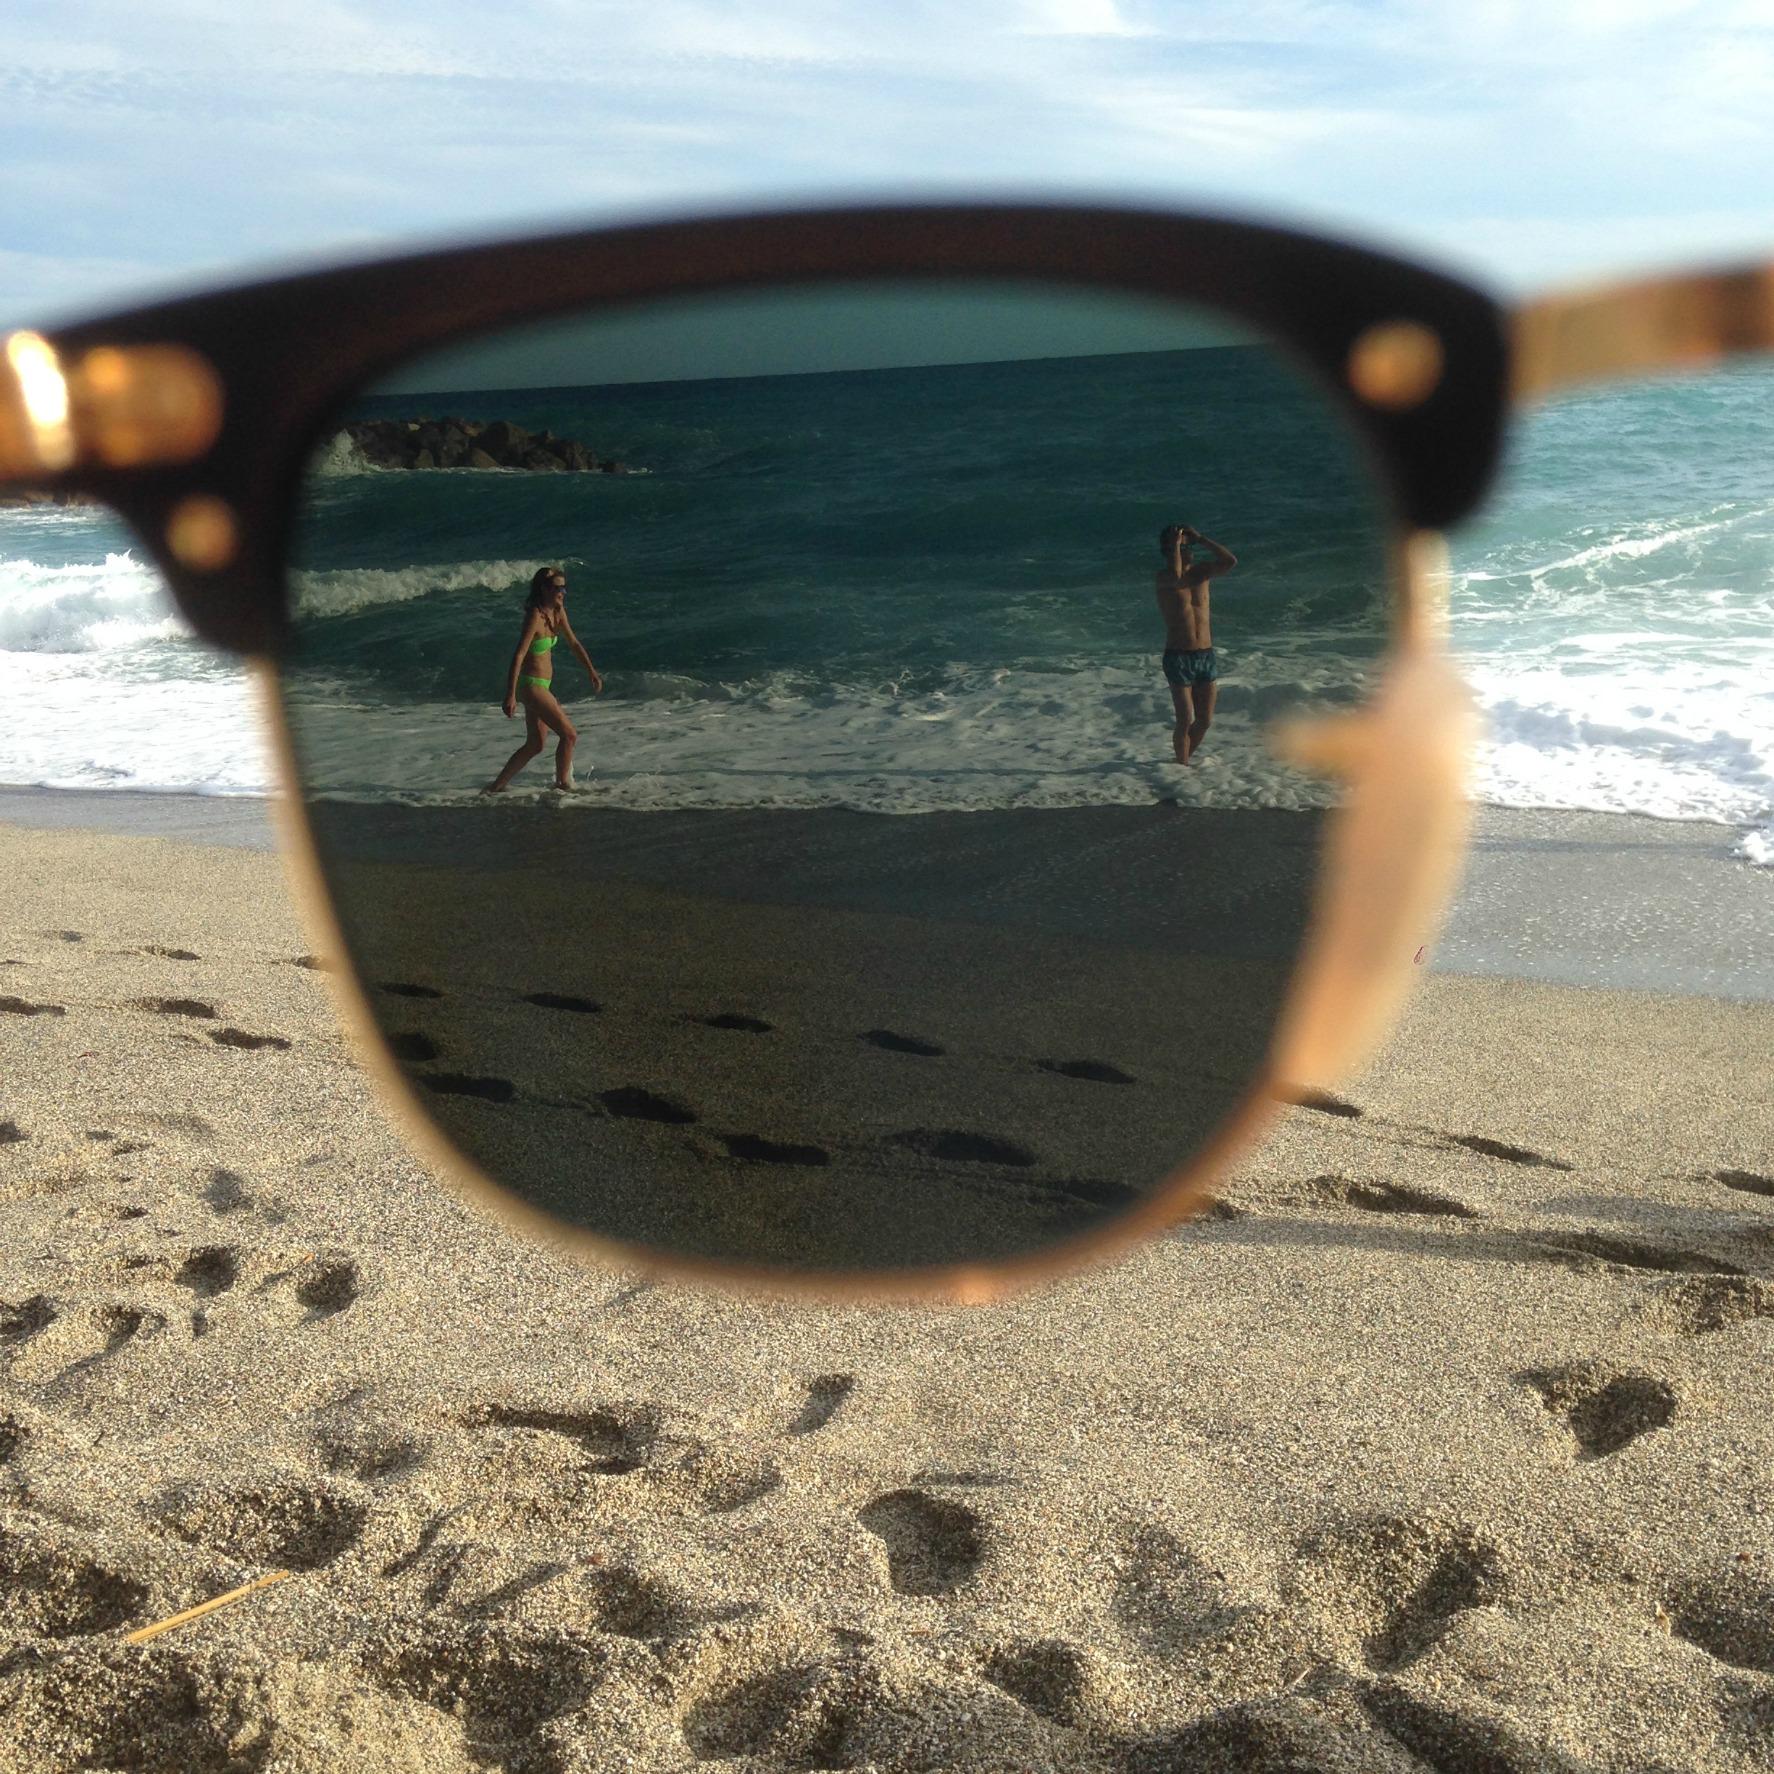 Sunglasses beach picmonkey